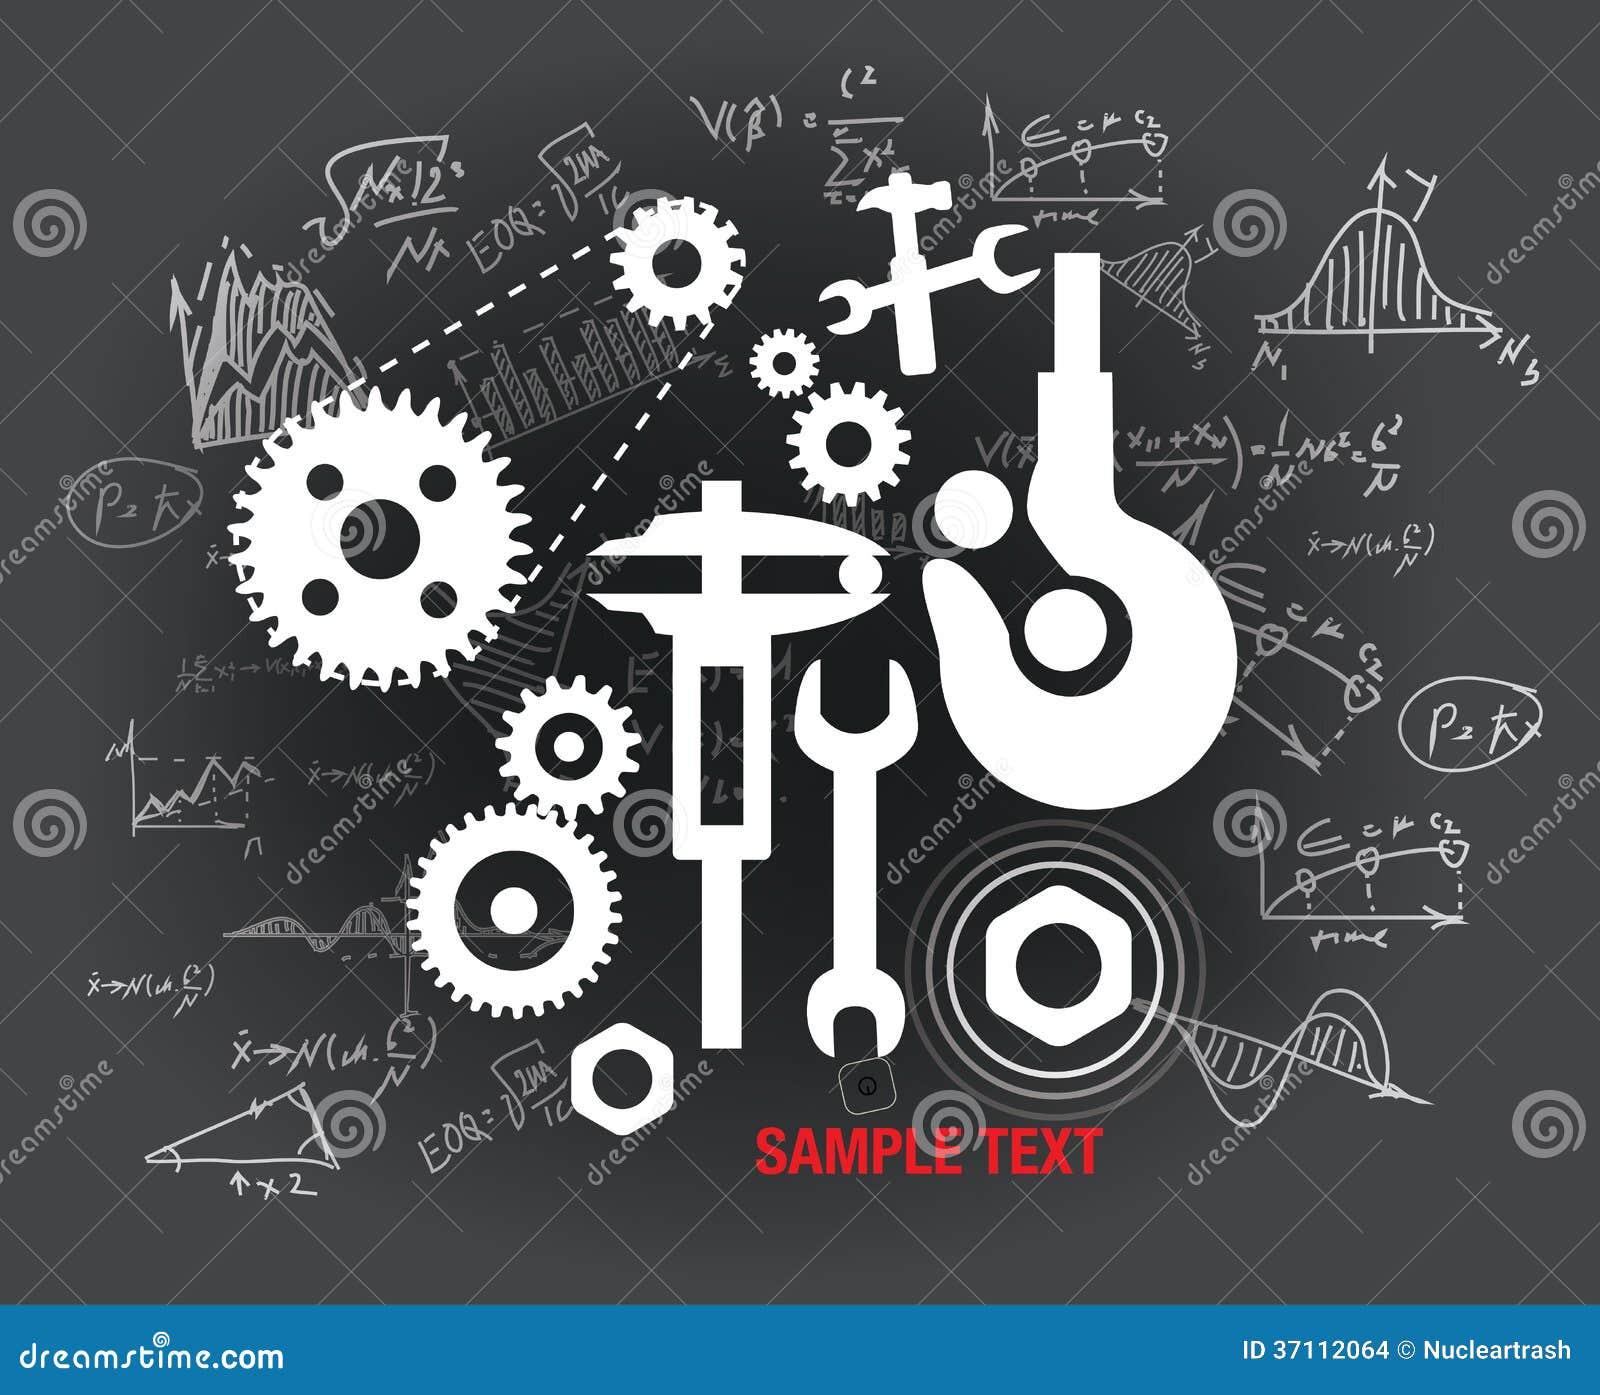 Mechanical Background Stock Images - Image: 37112064